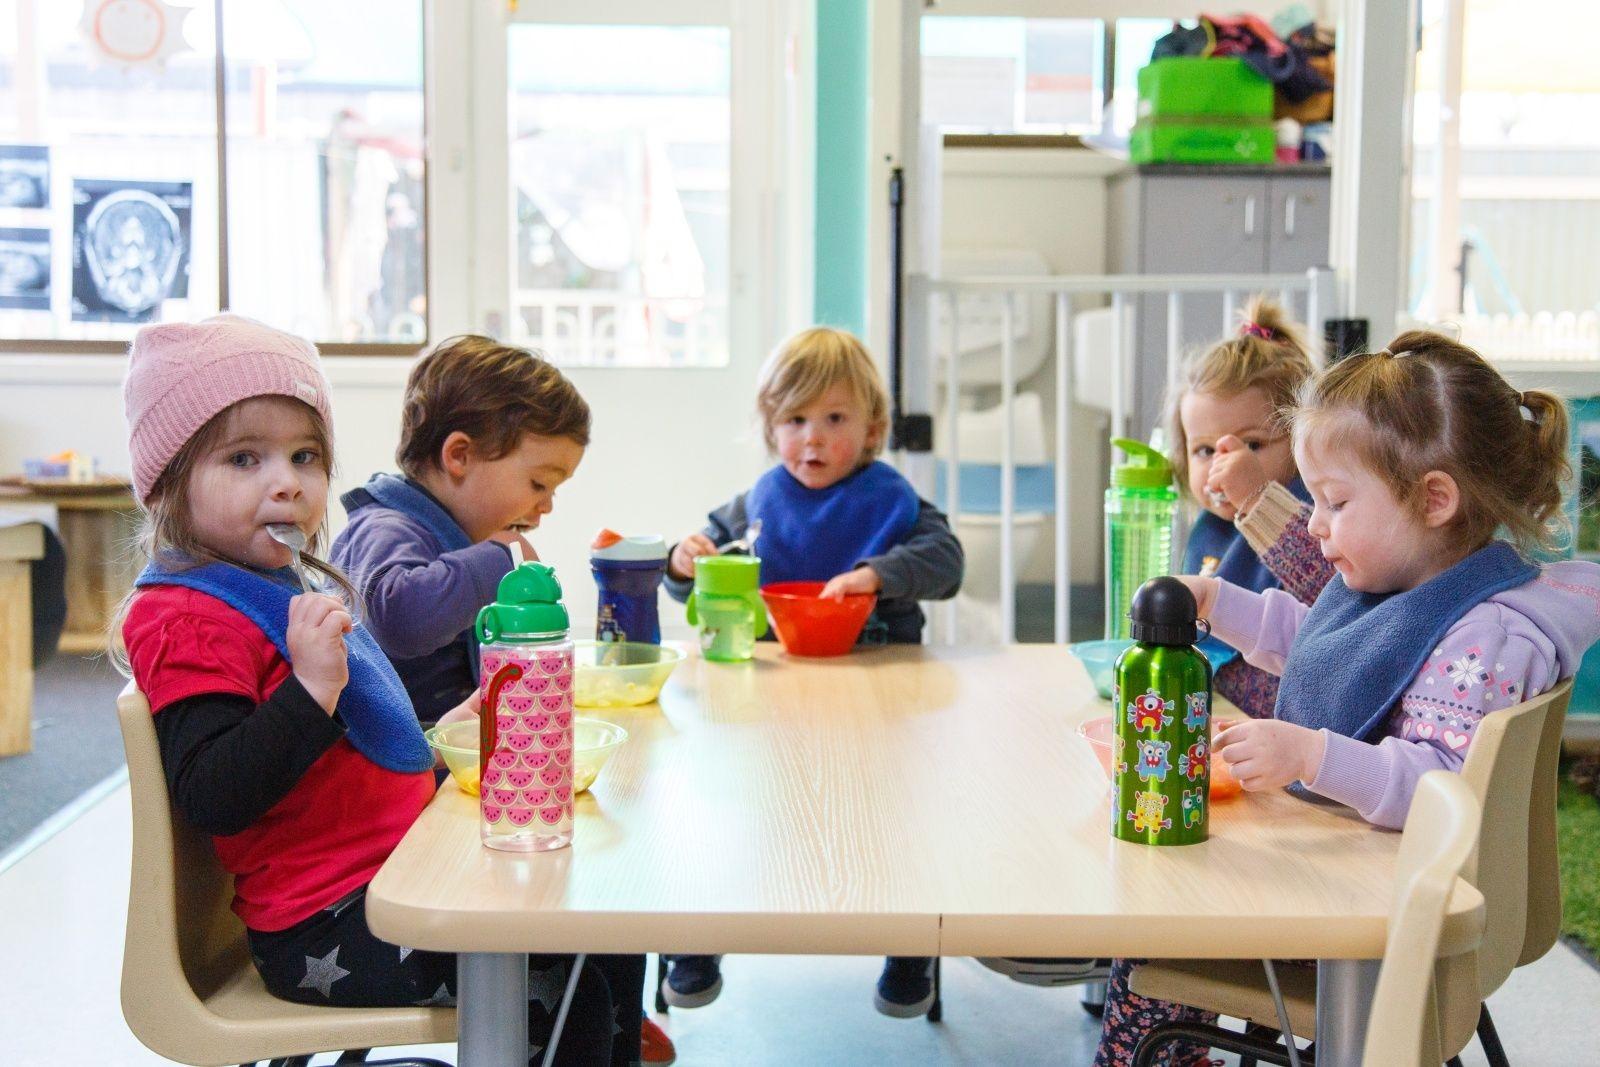 Children's Services - Greater Shepparton City Council